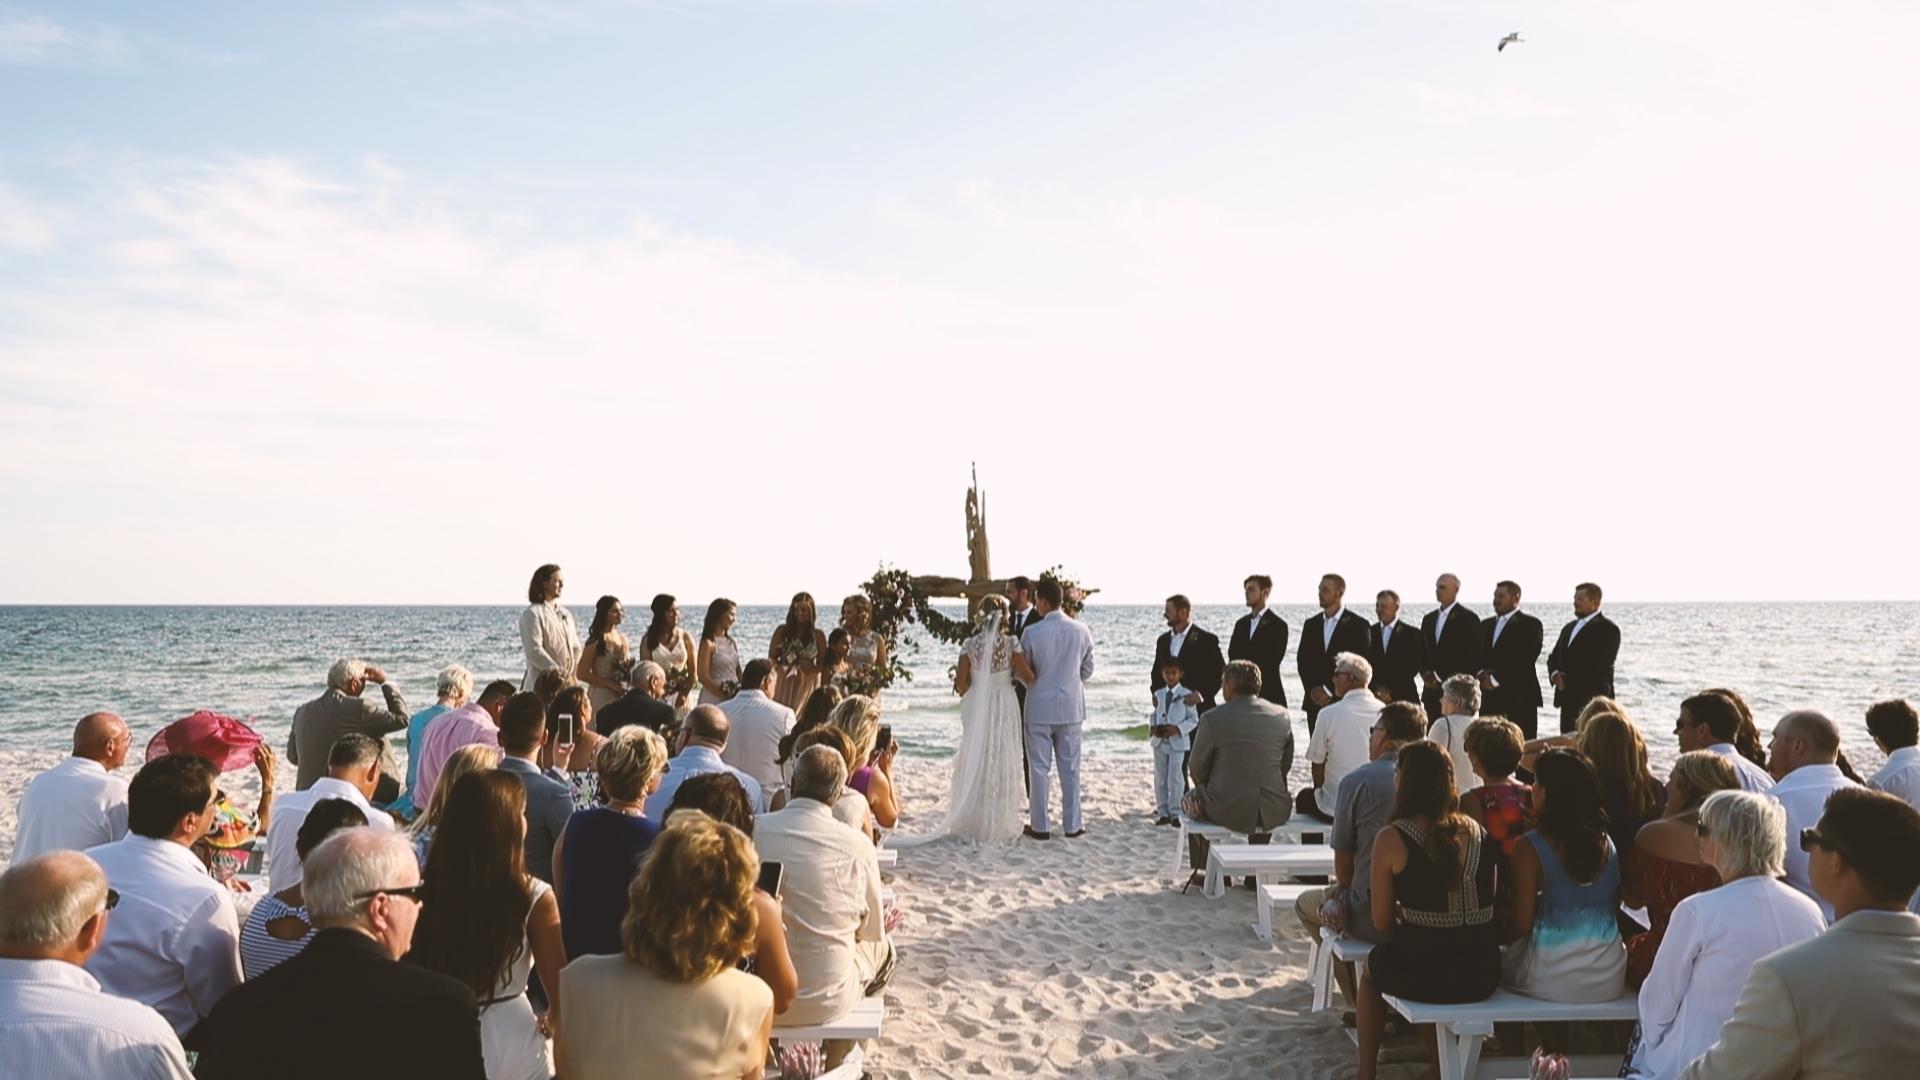 Beach Wedding - Bride Film